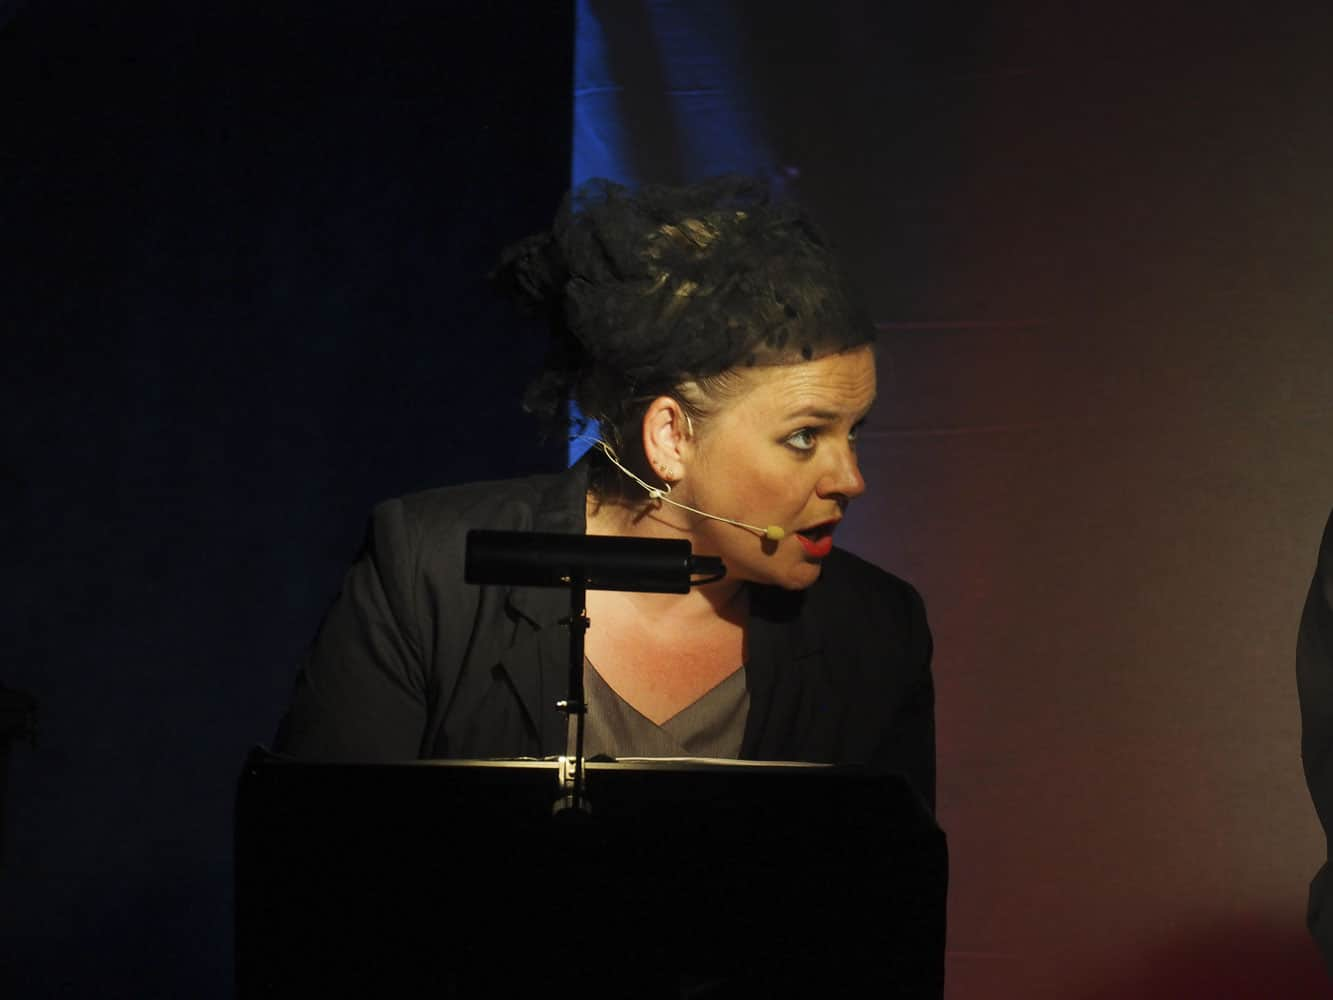 Miss Mary Morstan – Franziska Knetsch